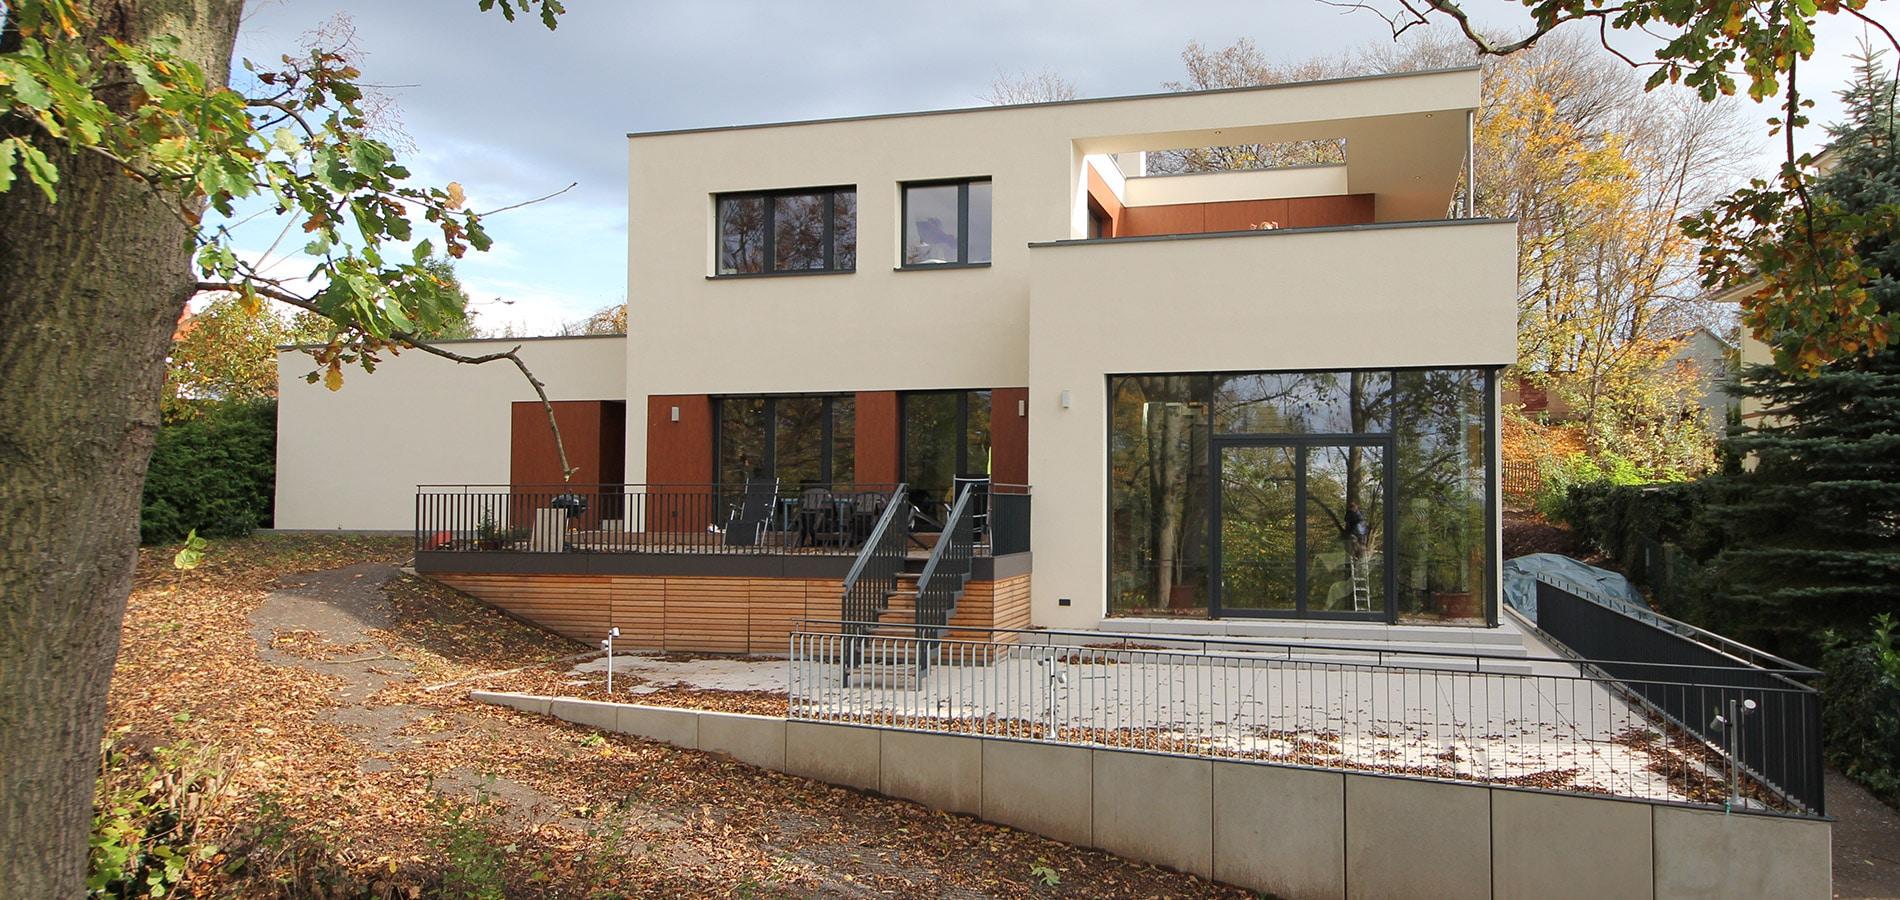 Architekt Nordhausen 1033 pmn neubau plusenergiehaus in nordhausen adobe architekten